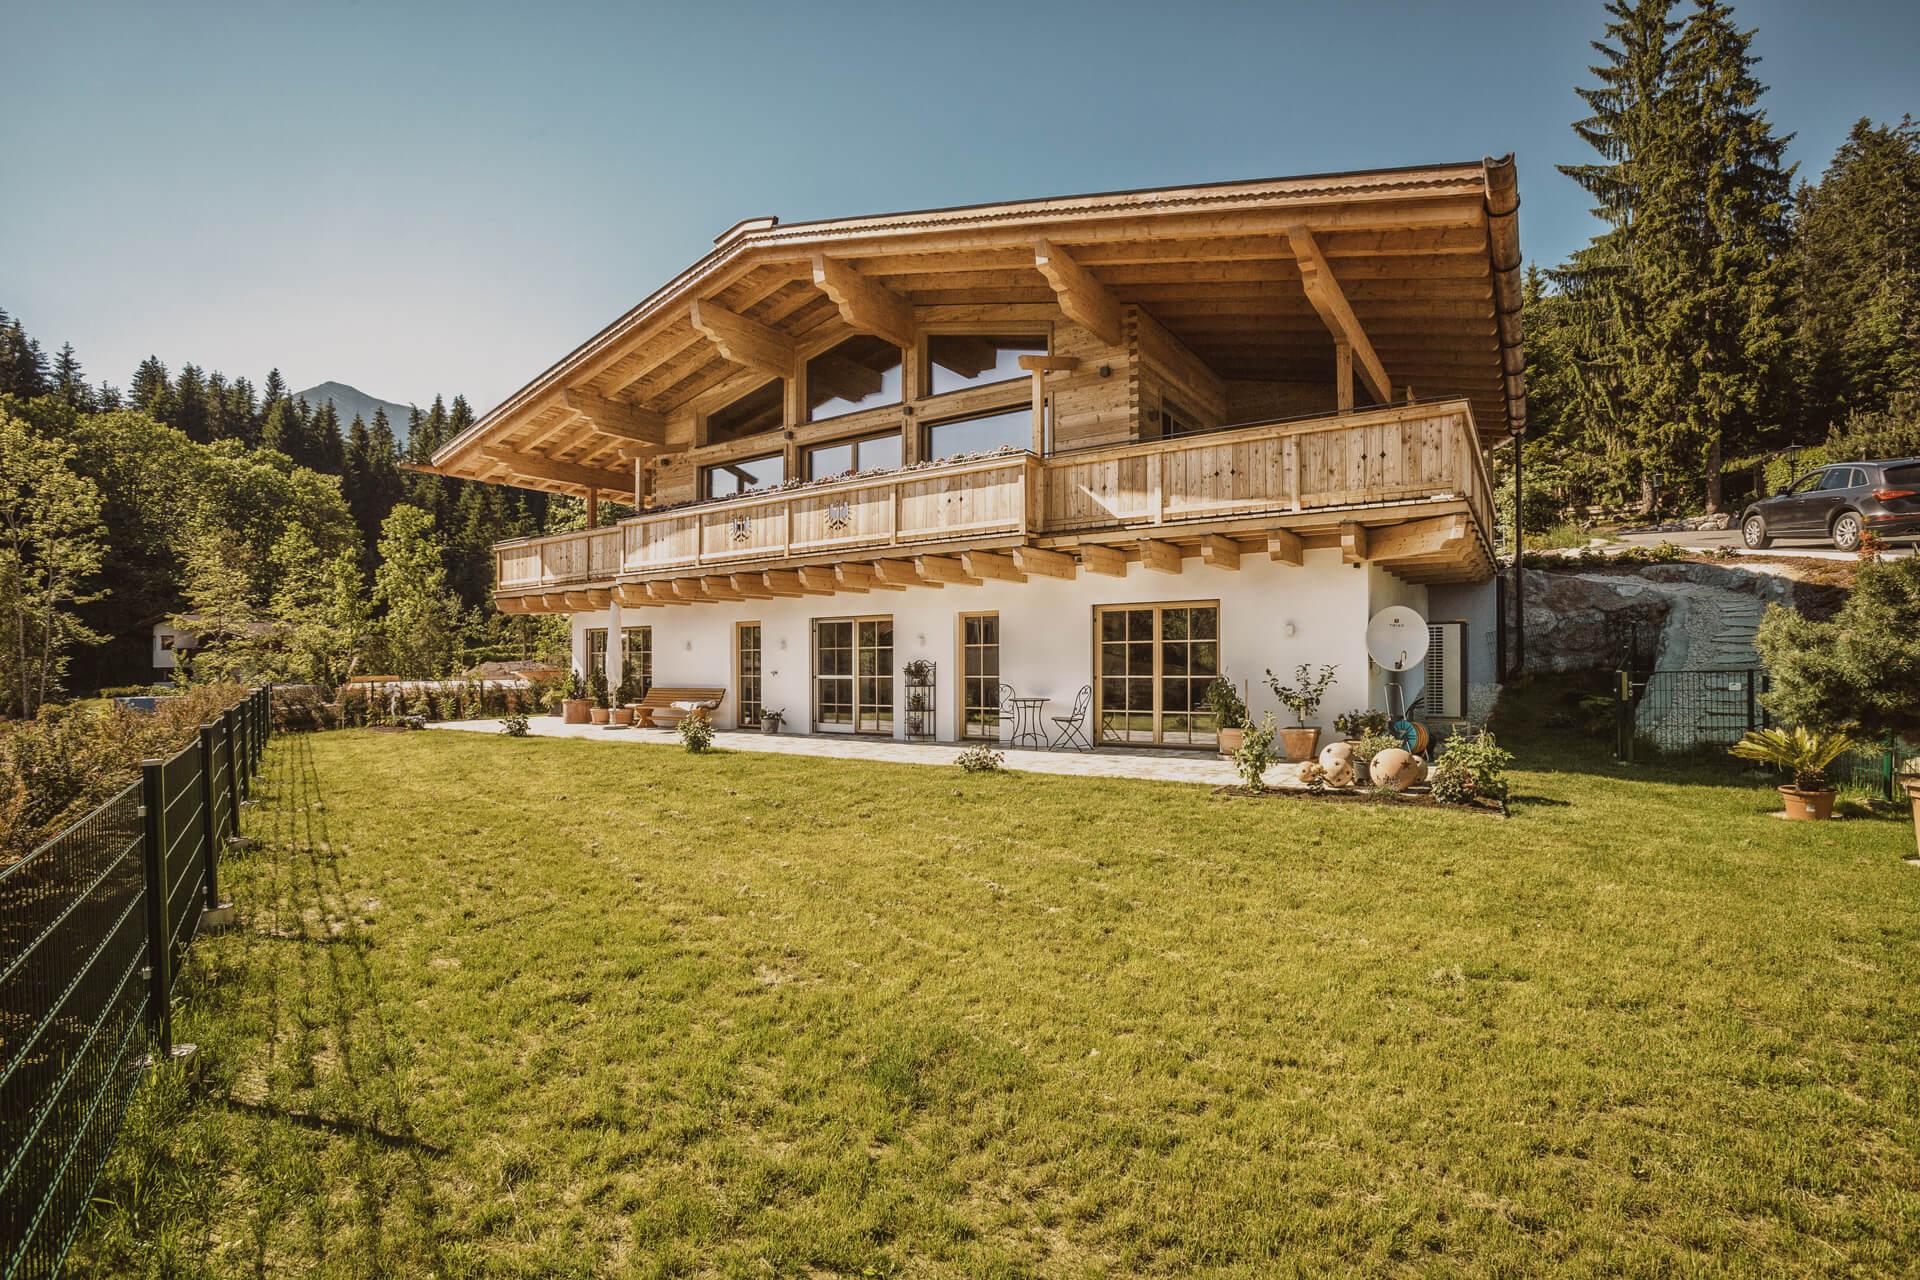 Chiemgauer Holzhaus Haus Kitzbuehel